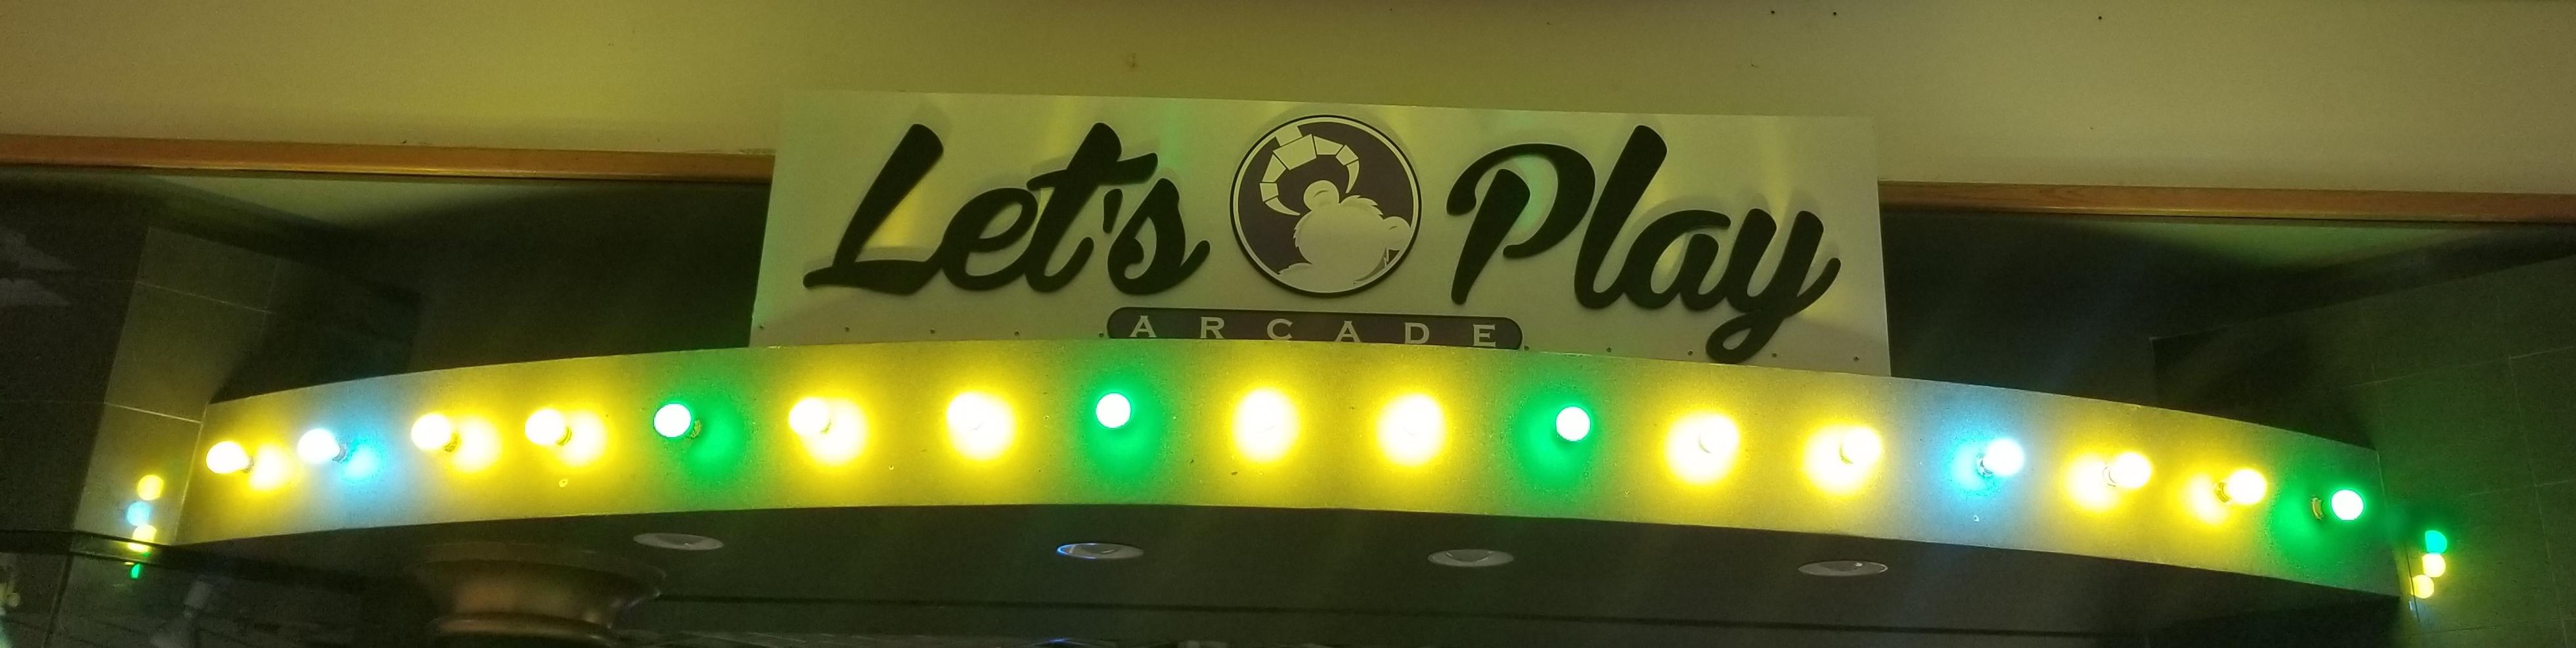 Let's Play Arcade